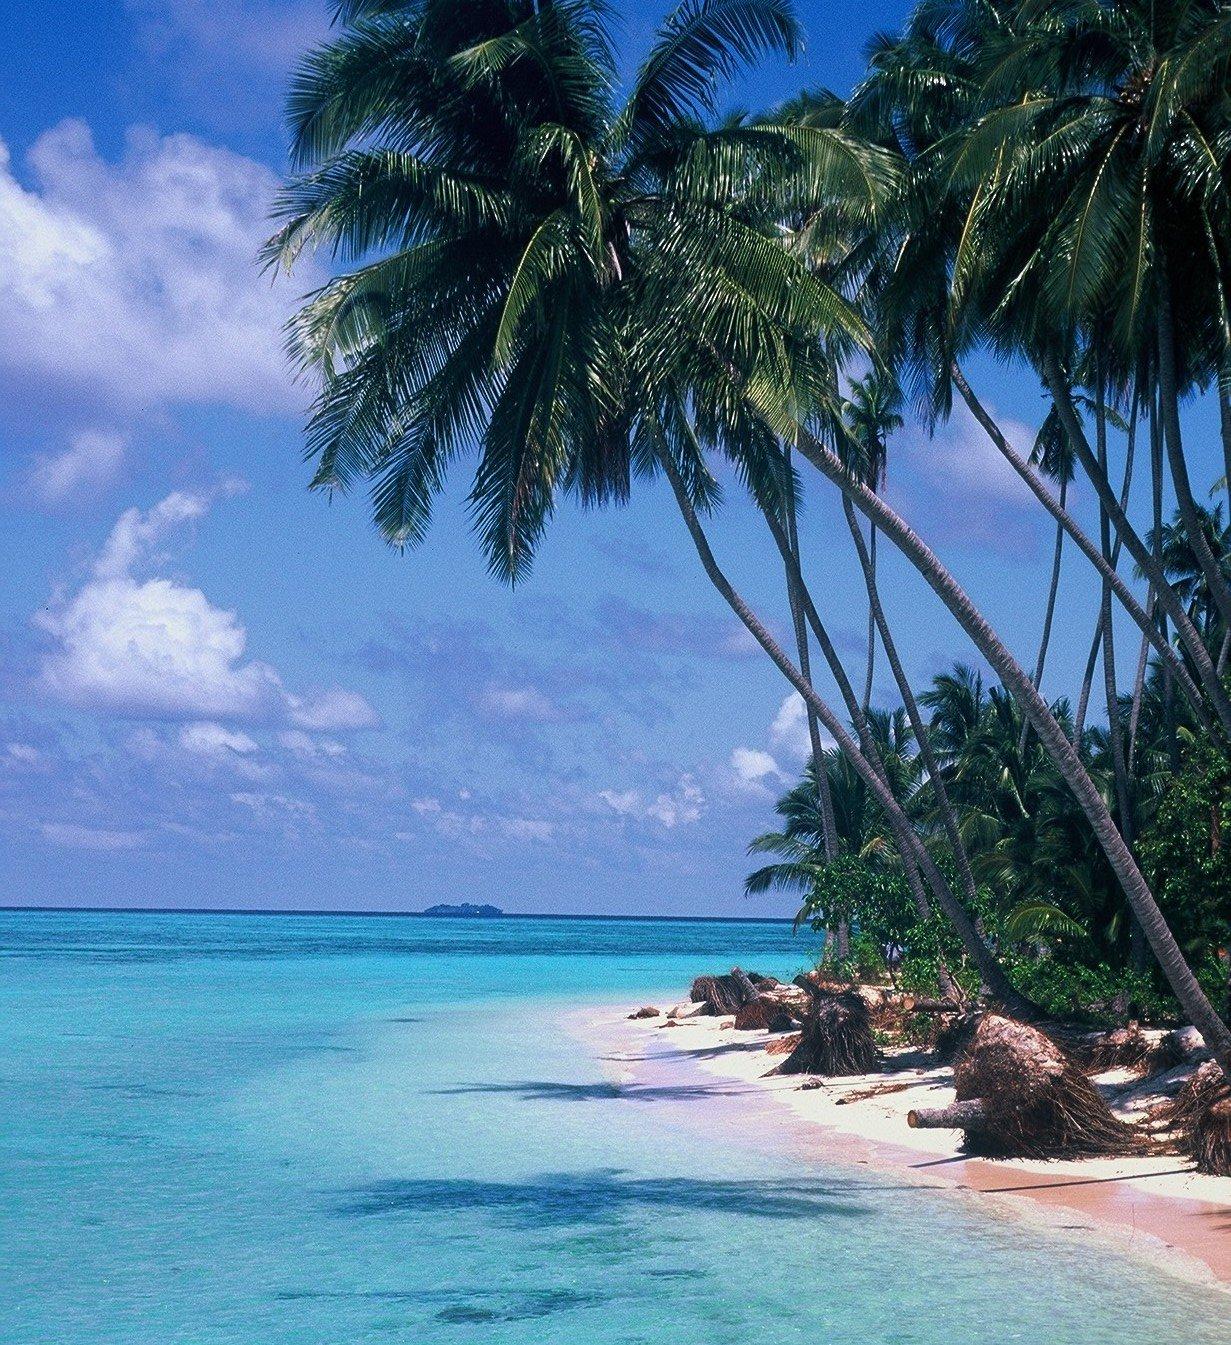 Malaysia Beaches: Mabul Island, Sabah Borneo